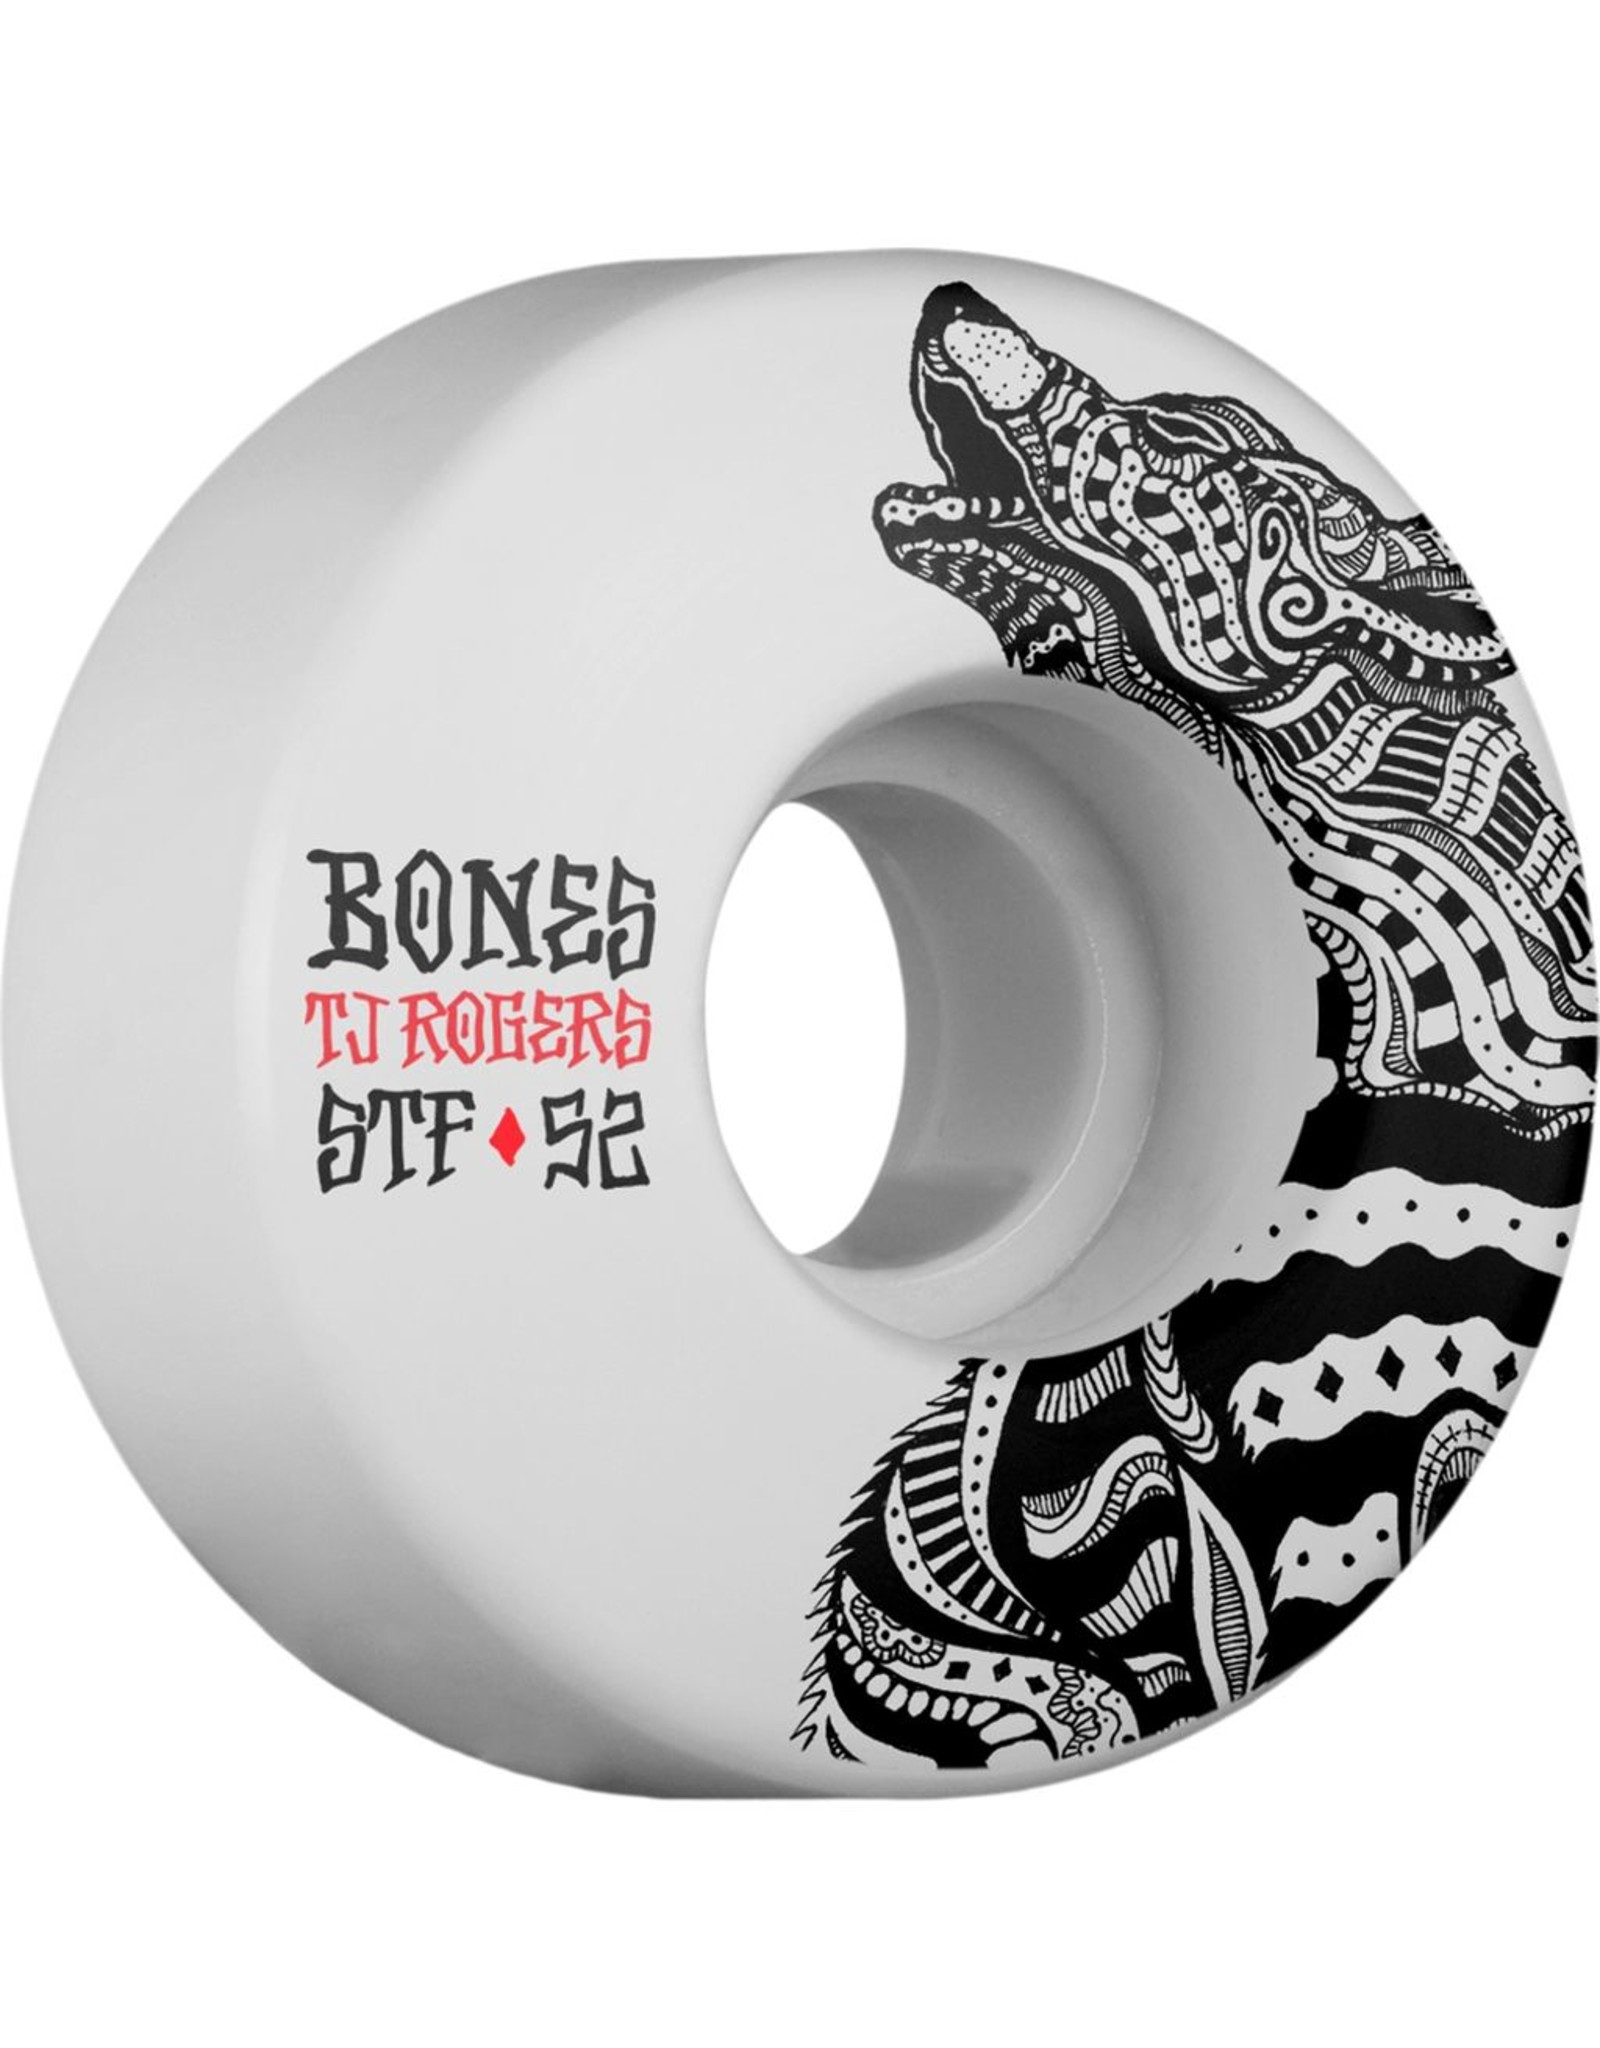 Bones Rogers STF Wolf 52mm Wheels